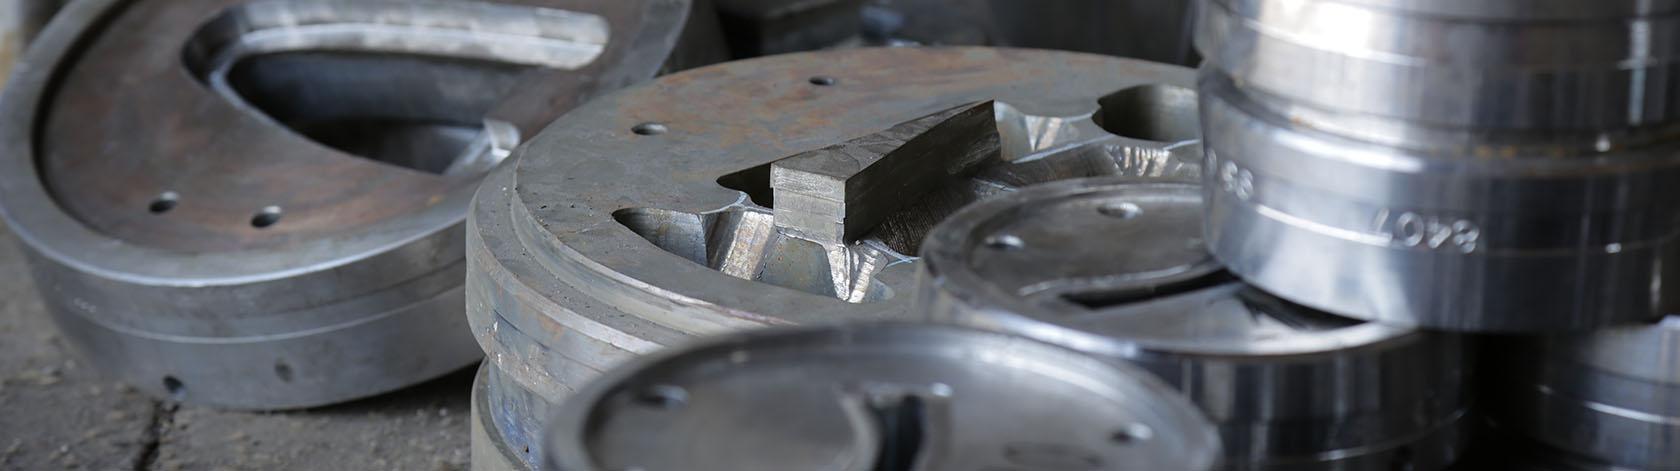 heat-treatment-of-hot-work-steels-3